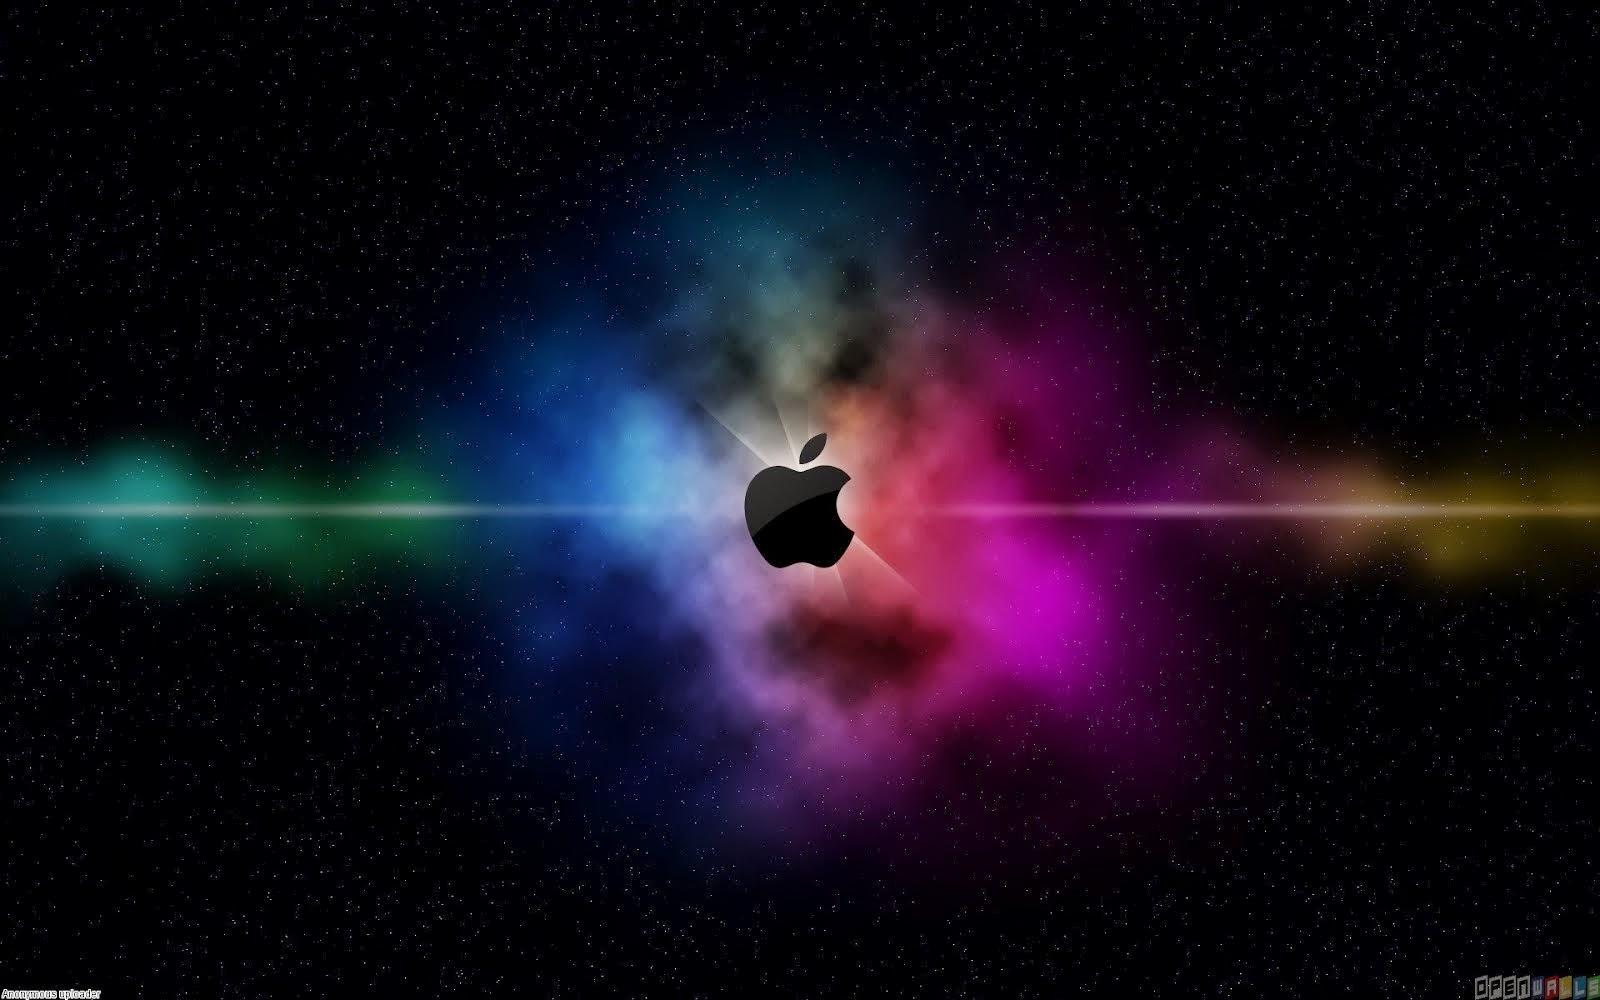 Download 800 Wallpaper Apple Space HD Paling Keren